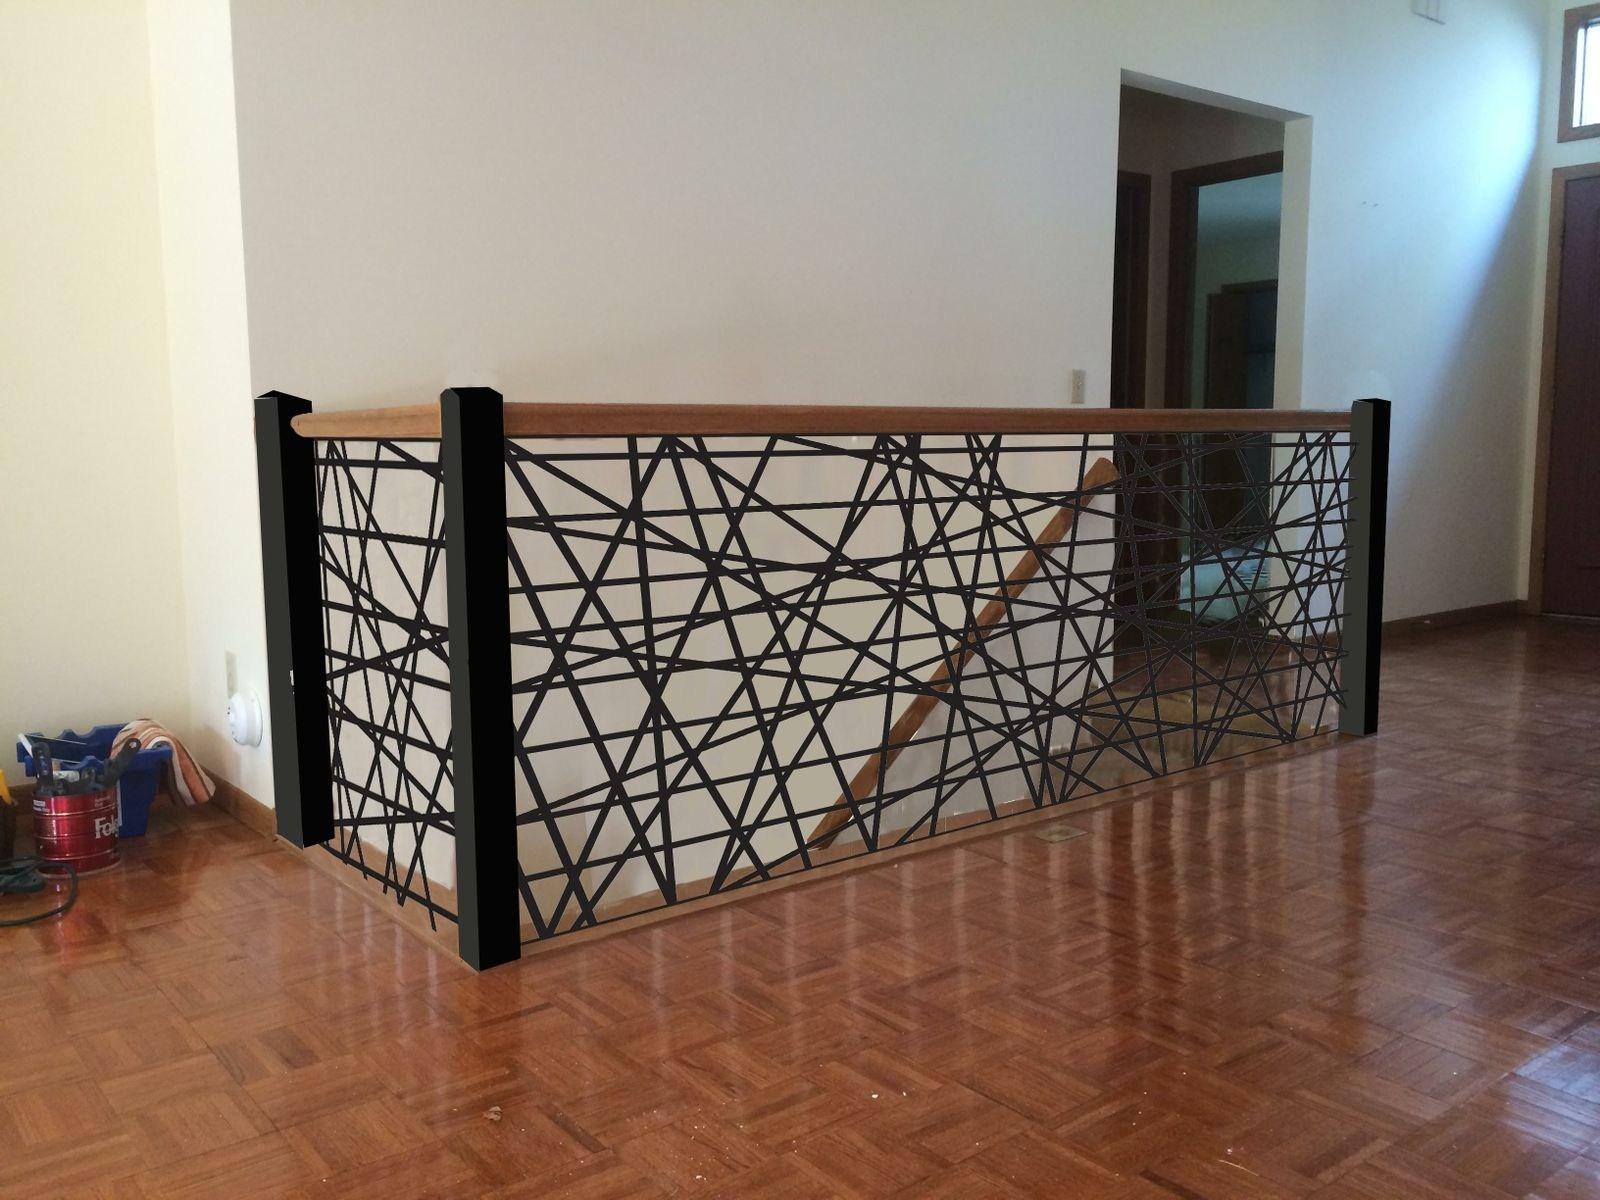 Handmade Custom Metal Stair Railings By Aesthetic Metals Inc   Custom Iron Stair Railing   Residential   French   Metal   Banister   Iron Work